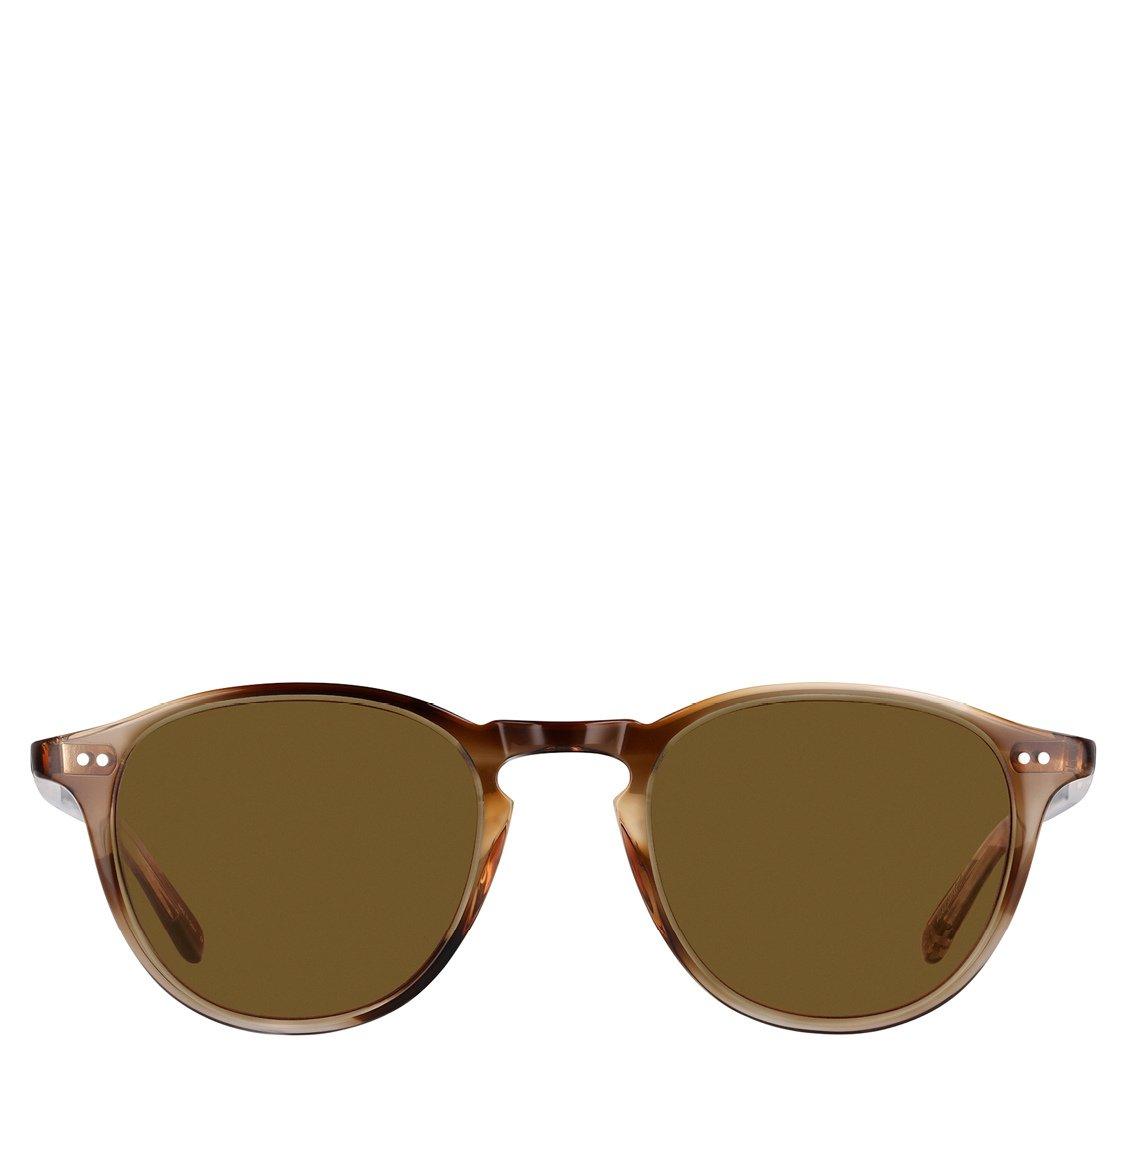 Garrett Leight Square Khaki Tortoise Acetate Γυαλιά Ηλίου